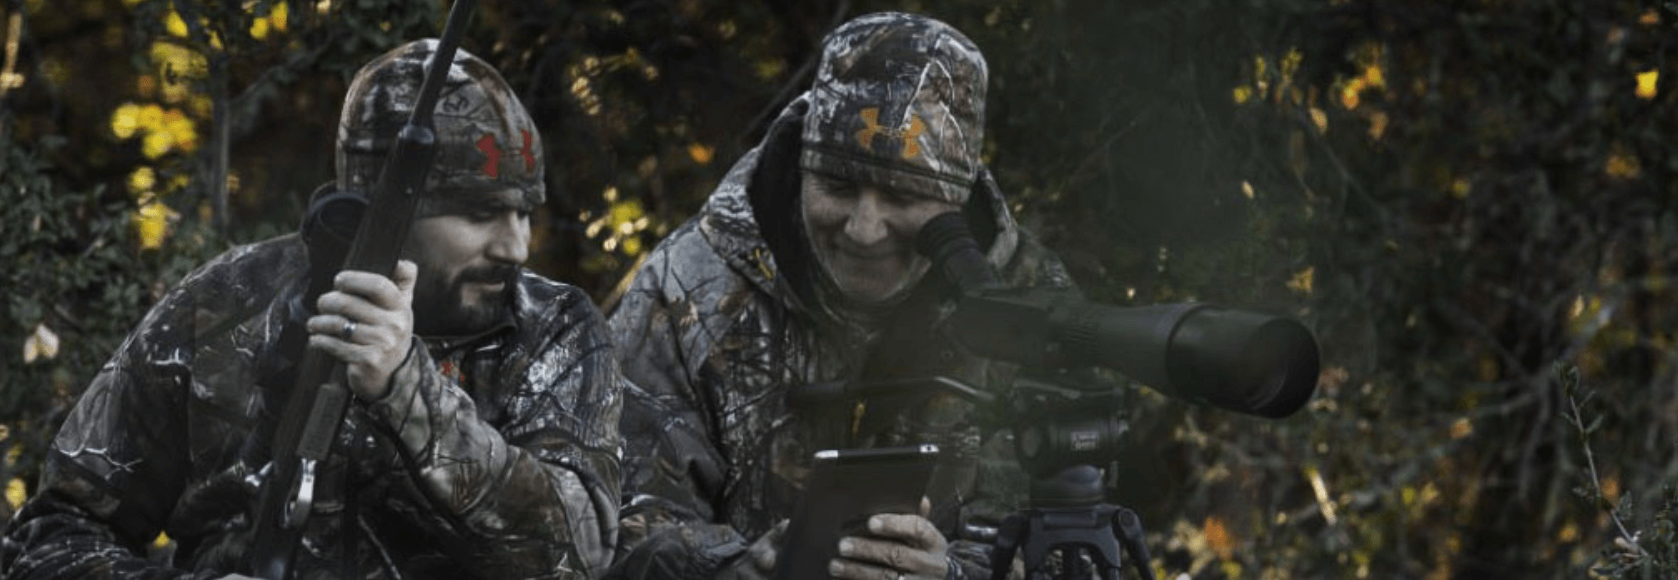 spotting-scopes